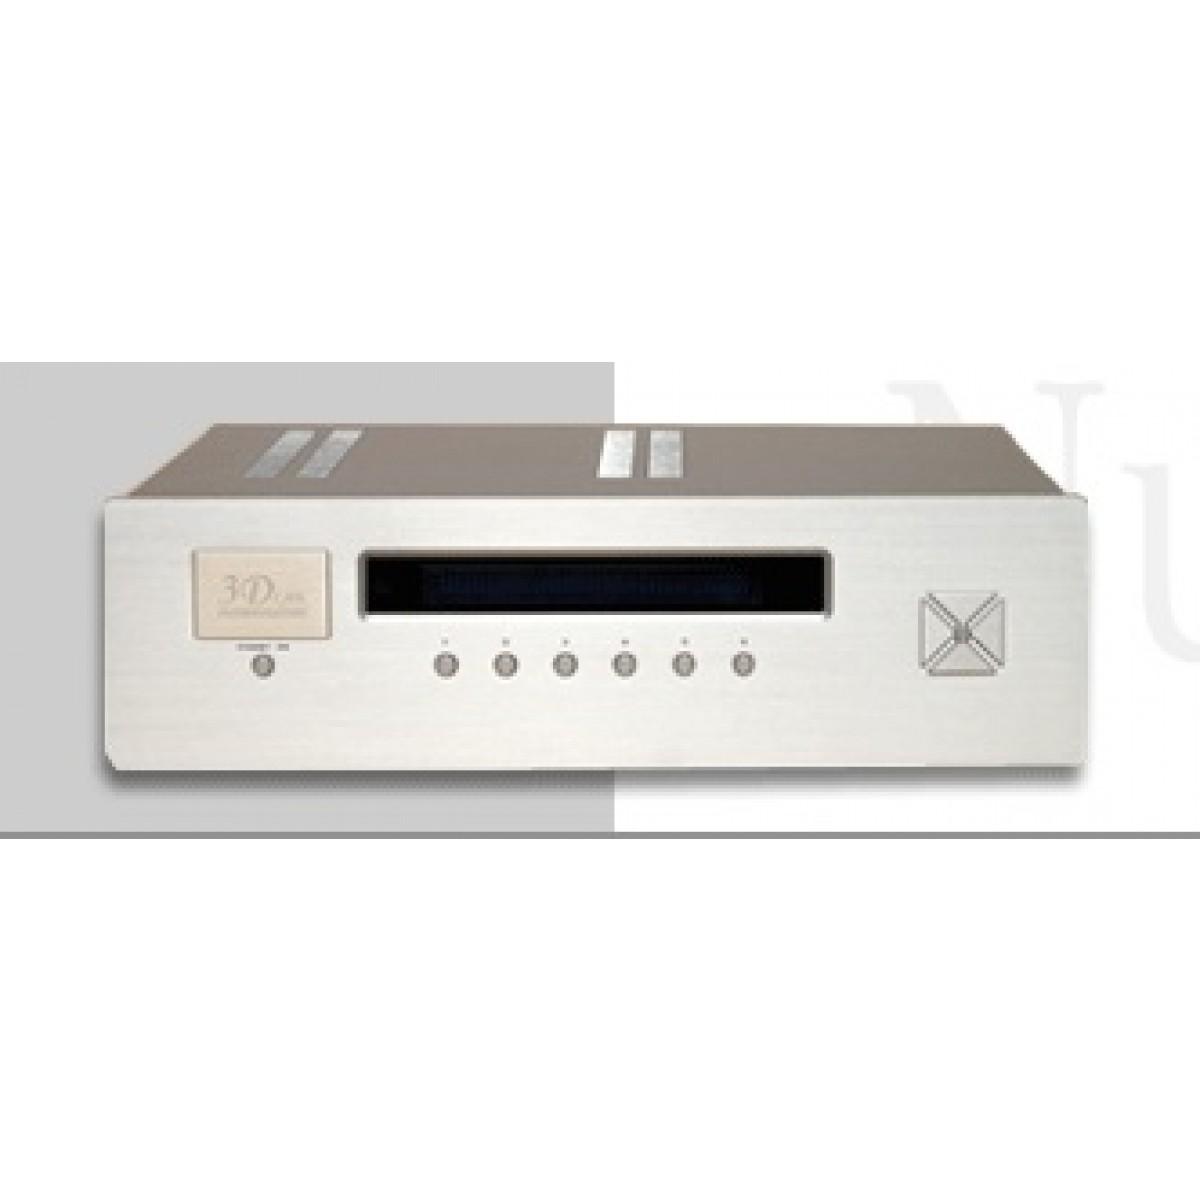 3D LAB-3D Lab PR6 Master-01